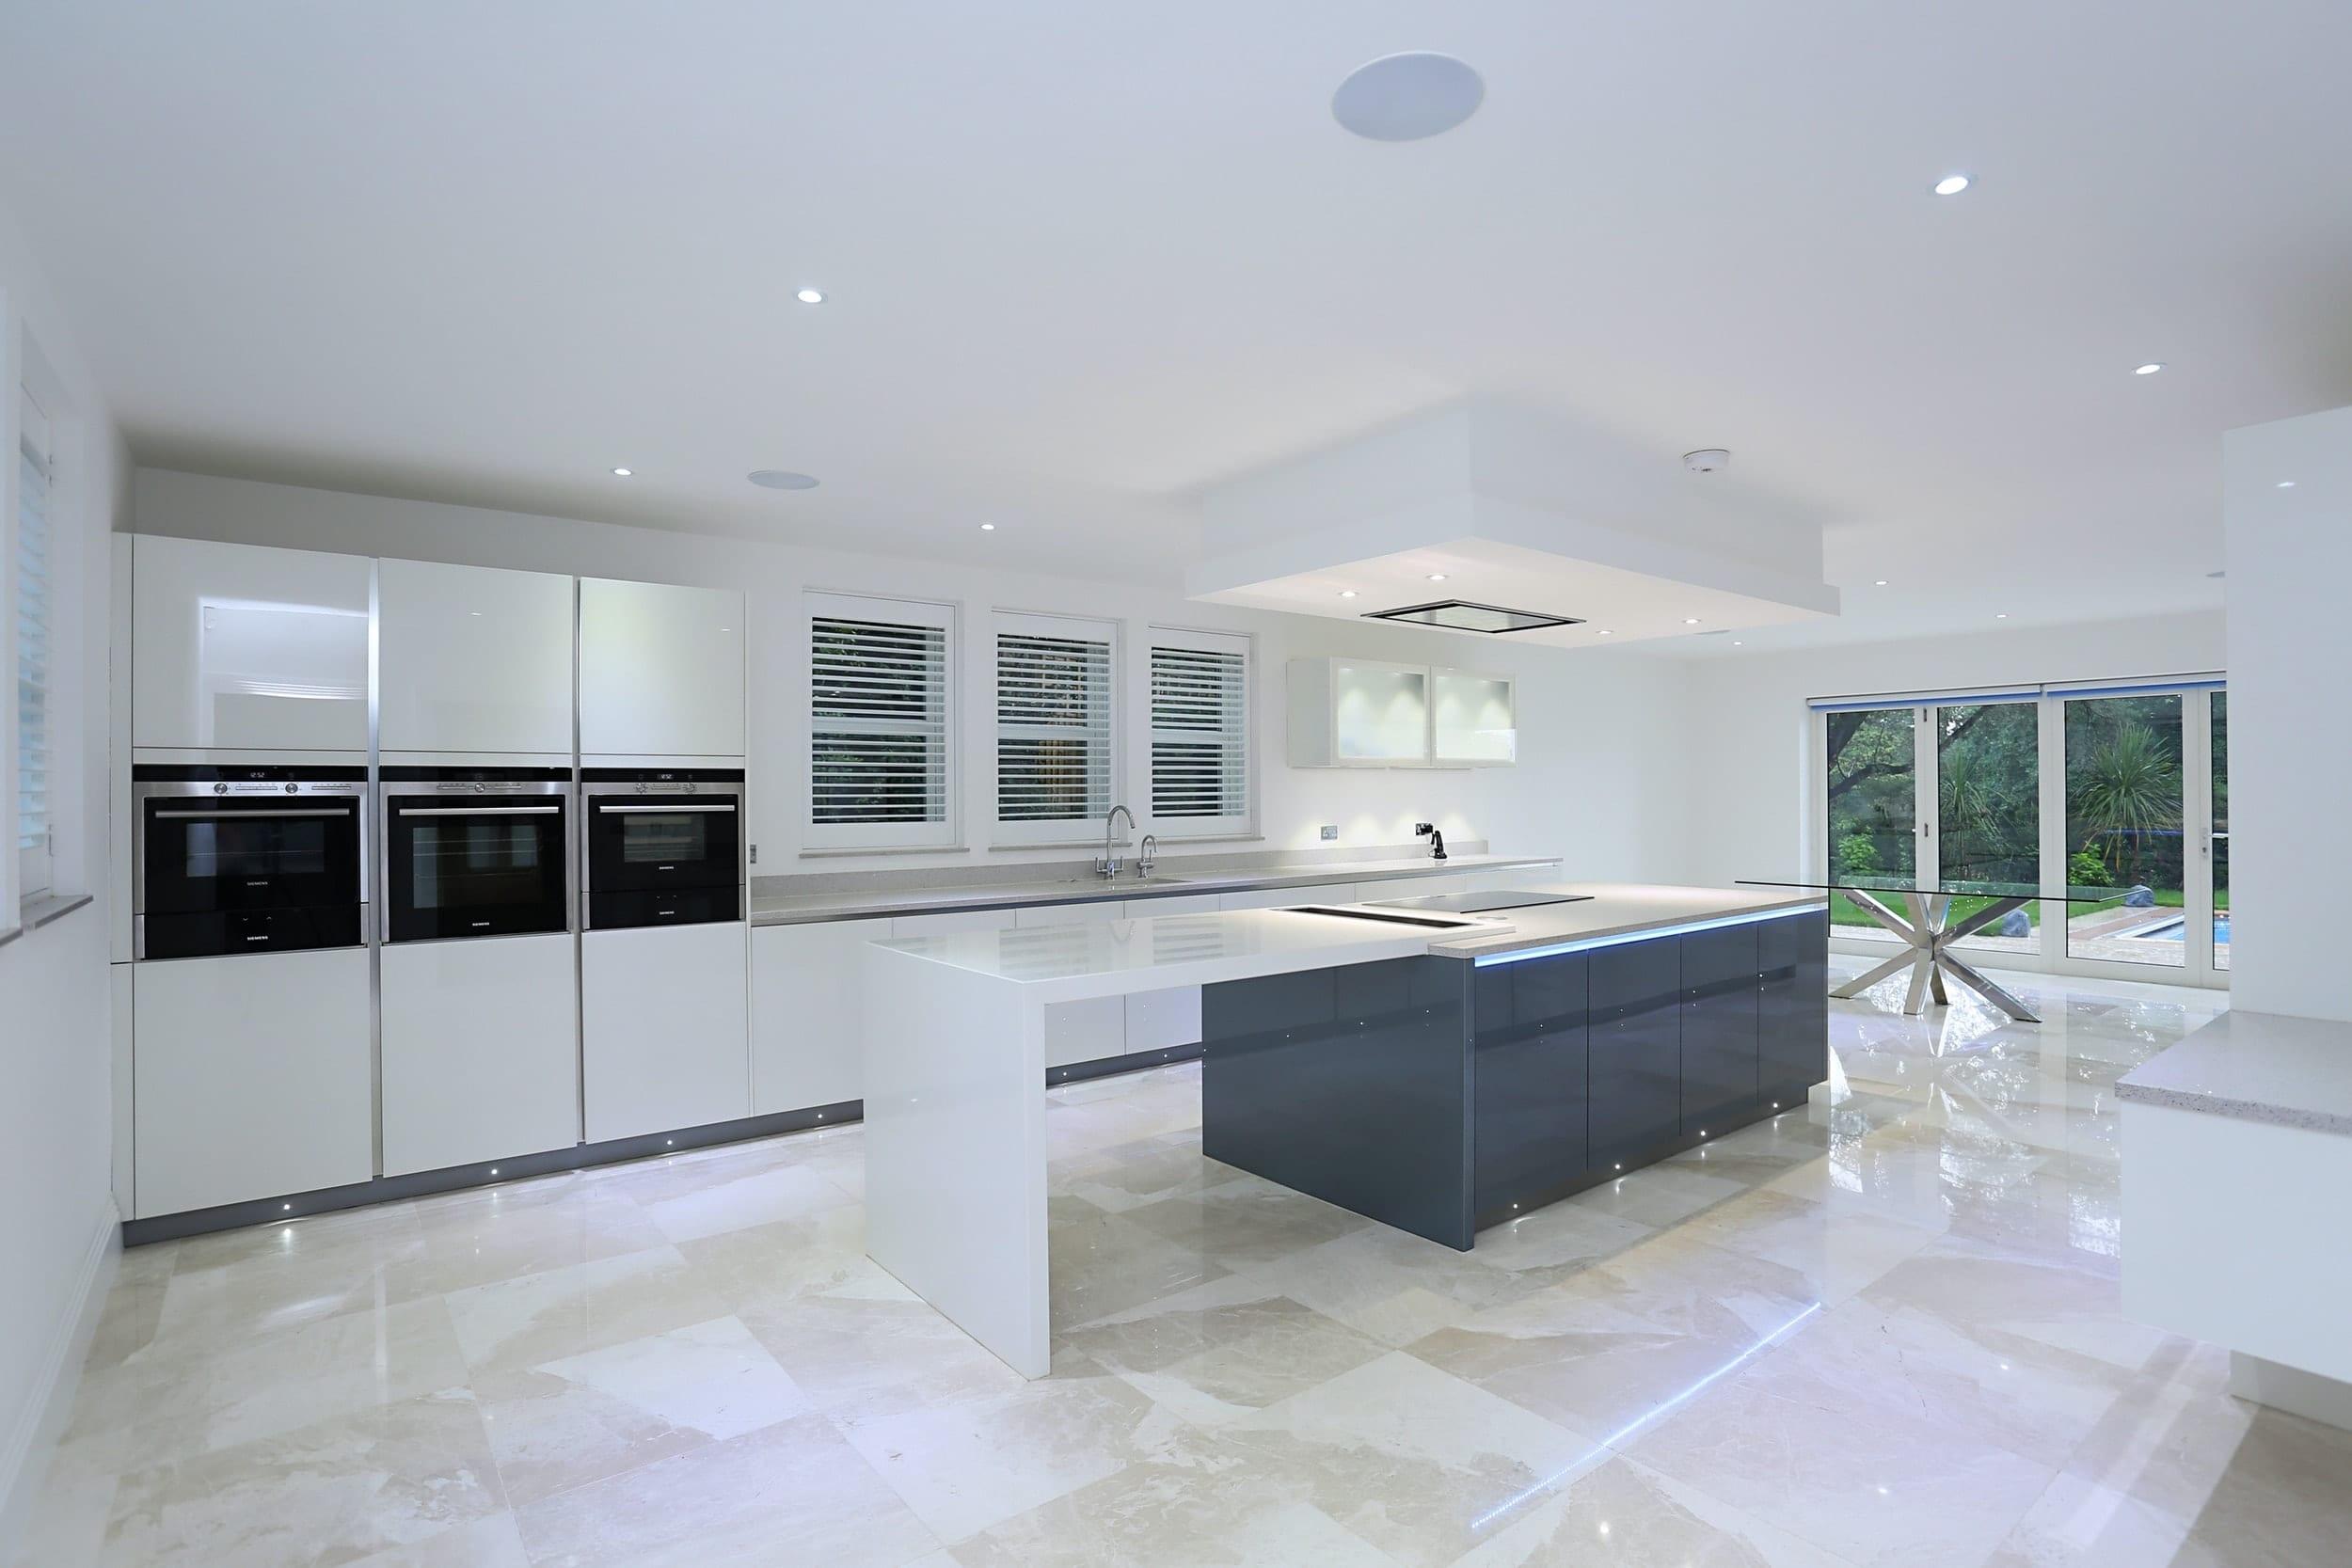 1. Handleless glass kitchen design 1 - Net Kitchens Direct, Walthamstow